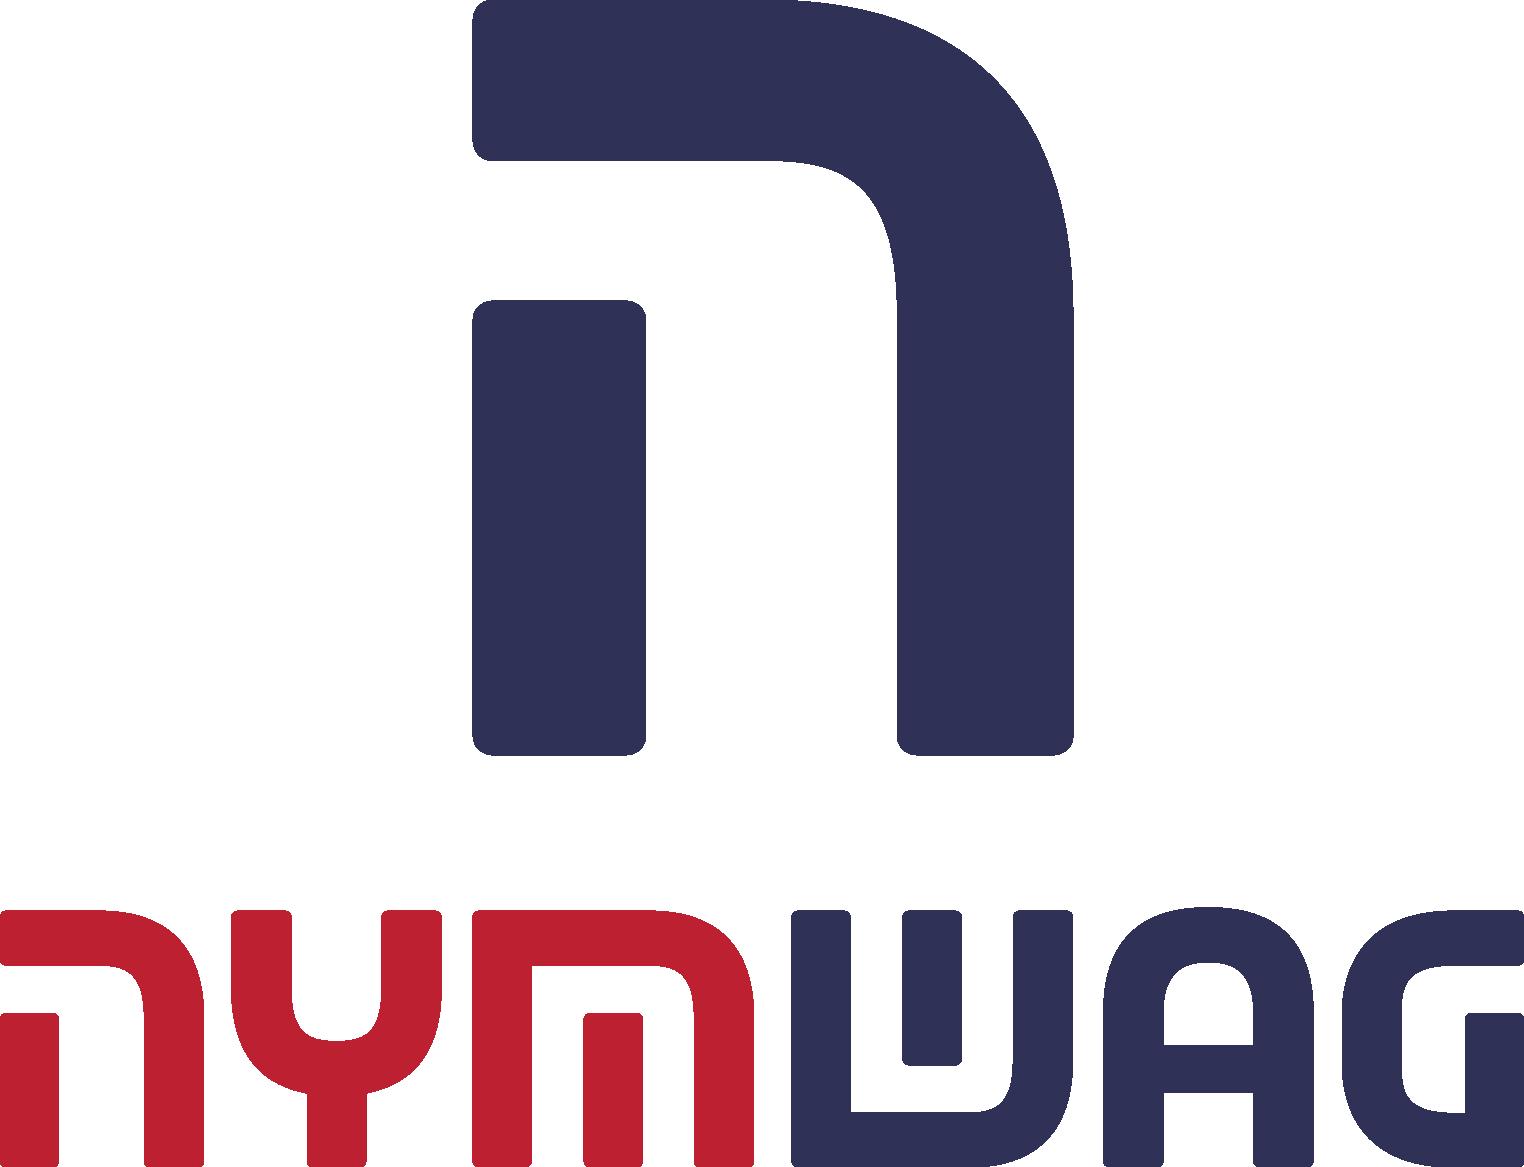 Nw Cmyk Duo Logoznacka Rb